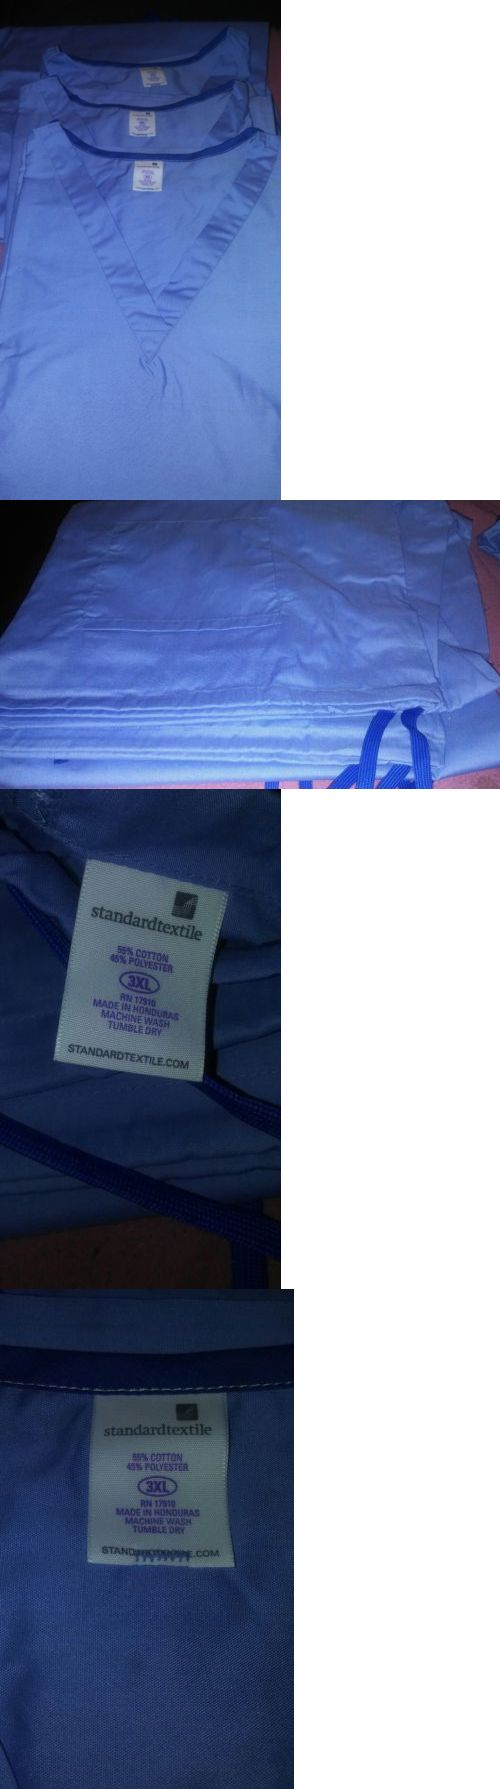 Sets 105432: Standard Textile Unisex V Neck Reversable Medical Nursing Scrubs Sz 3X -> BUY IT NOW ONLY: $80 on eBay!